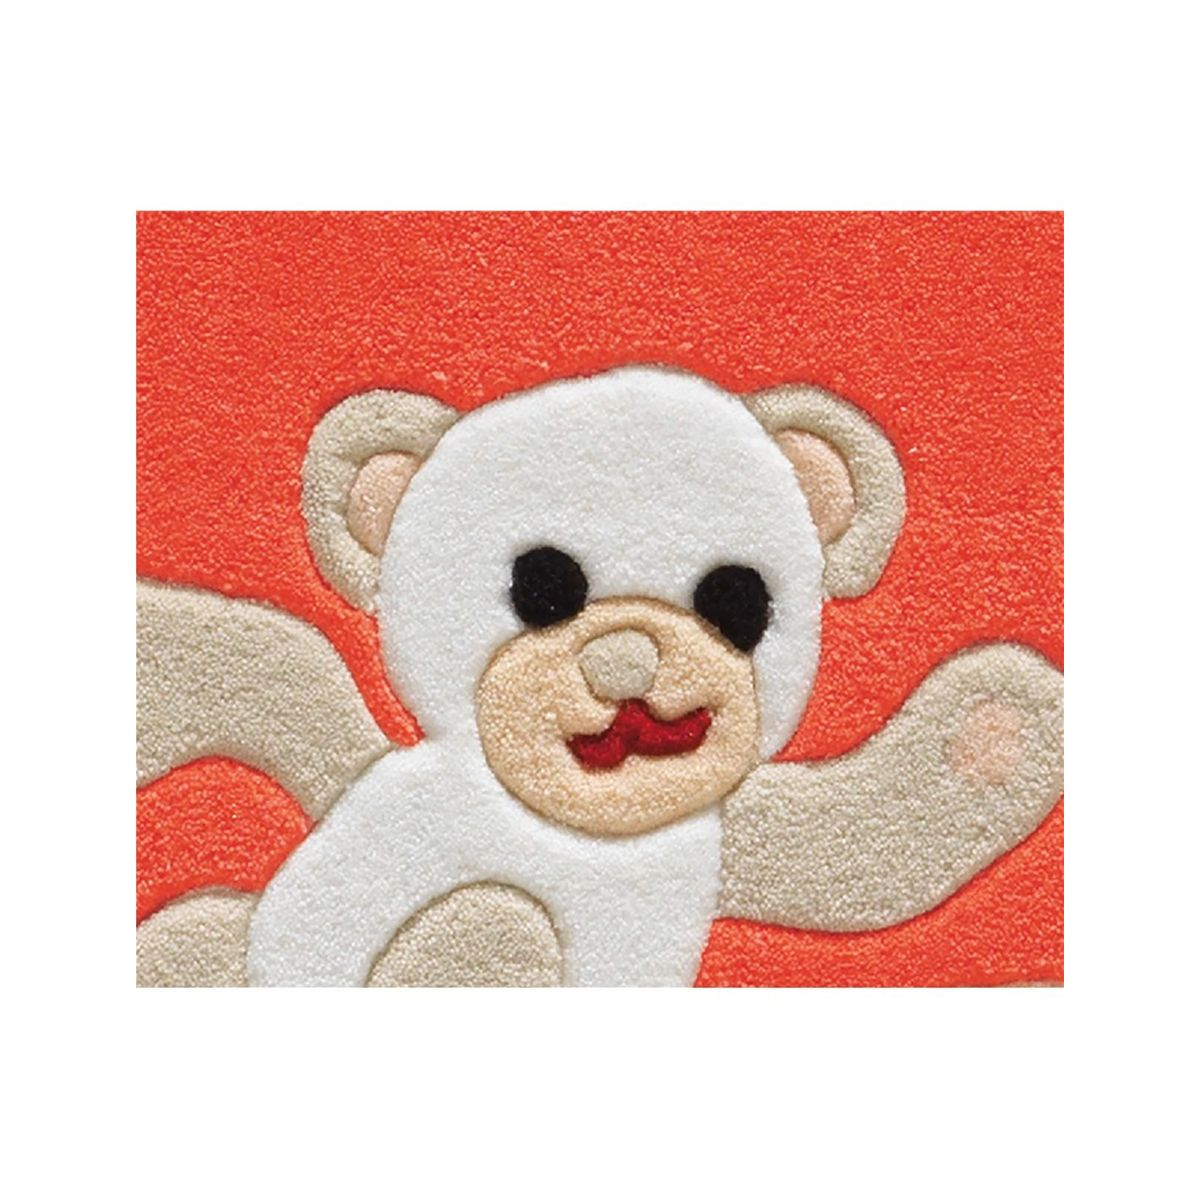 Tapis Tisse A La Main Joy 4117 Teddy Taille 110x160 Cm Tapis Tapis Tisse